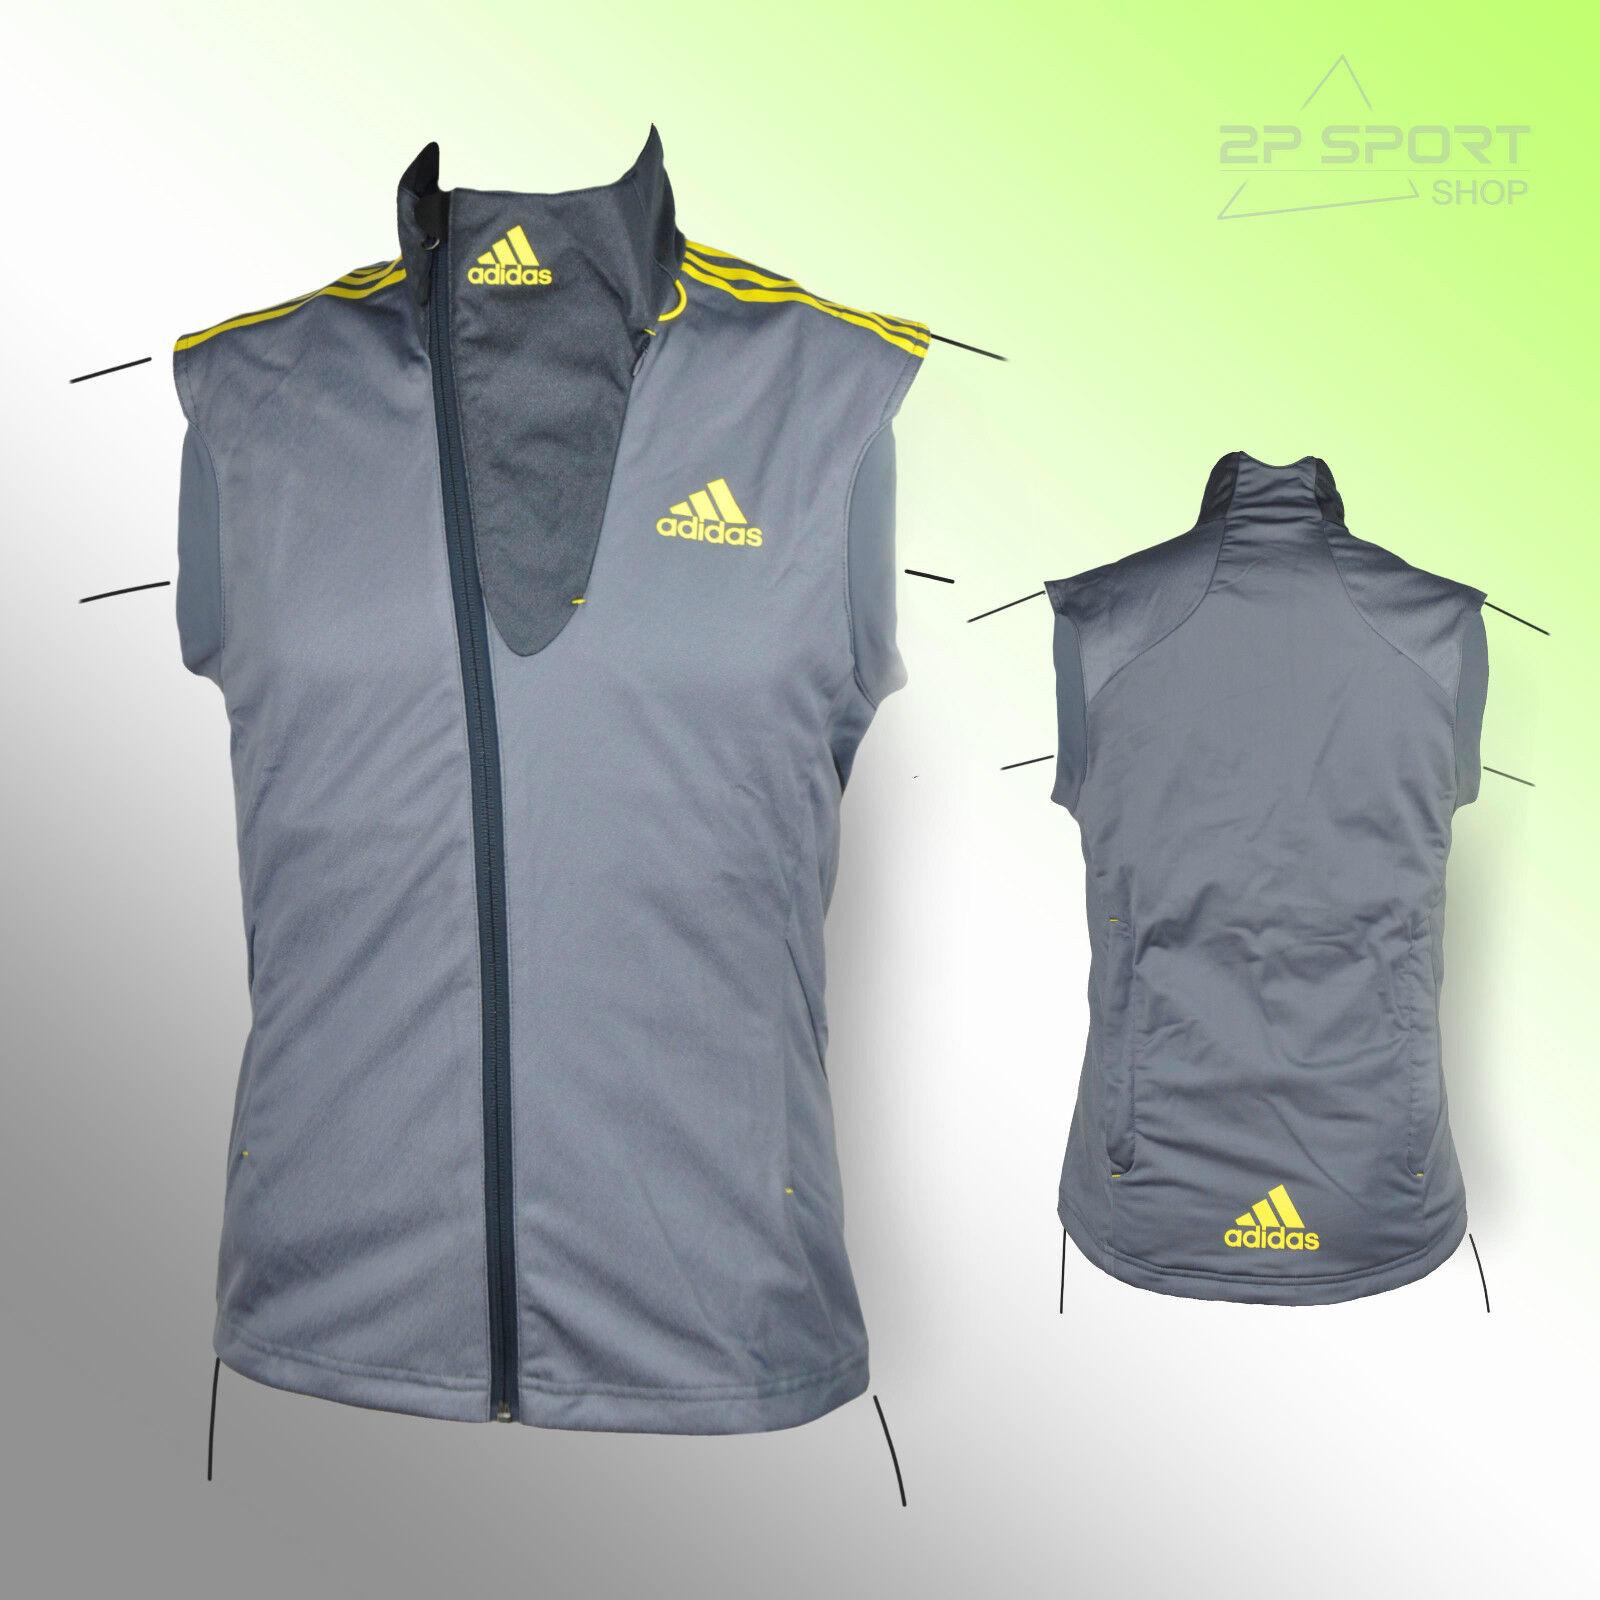 Adidas perforhommece gilet veste teamsport DSV Majówki g77143 Ath. vest m messieurs